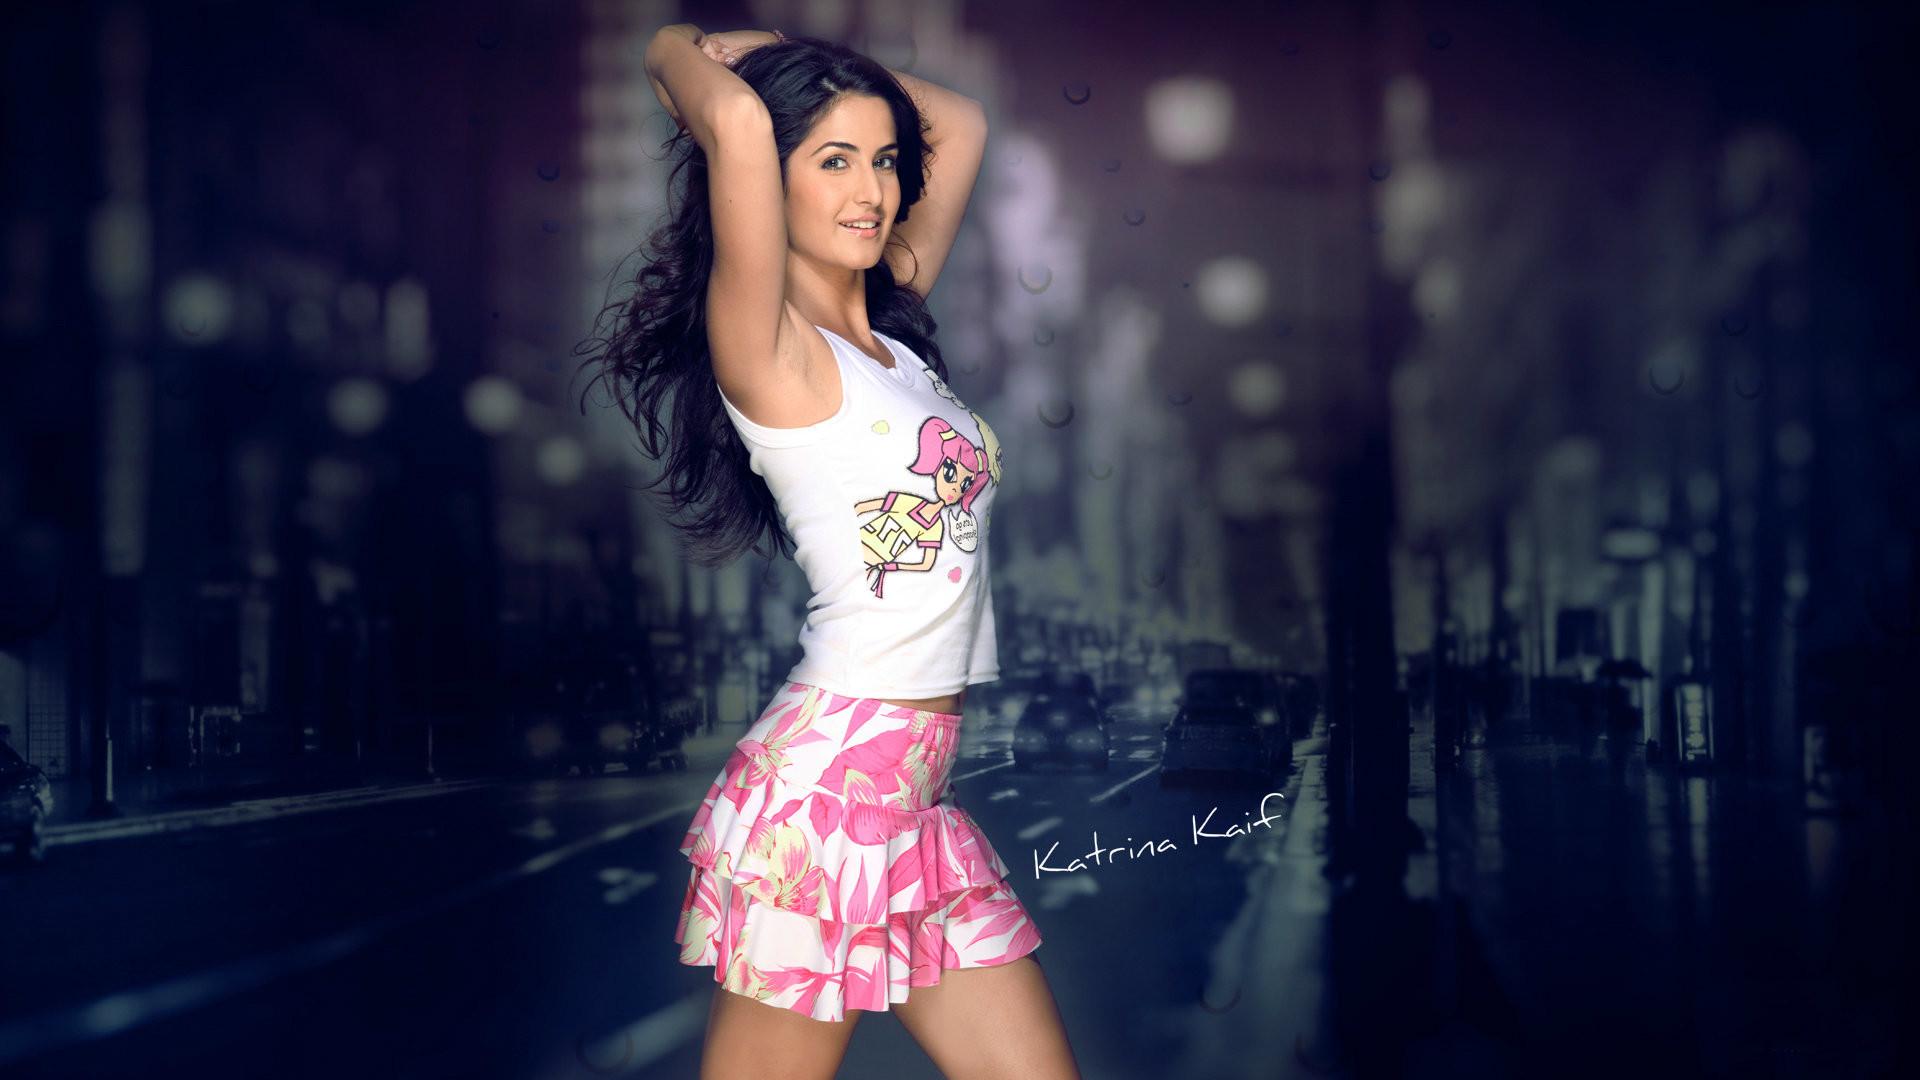 Pretty Bollywood Girl Katrina Kaif HD Wallpaper